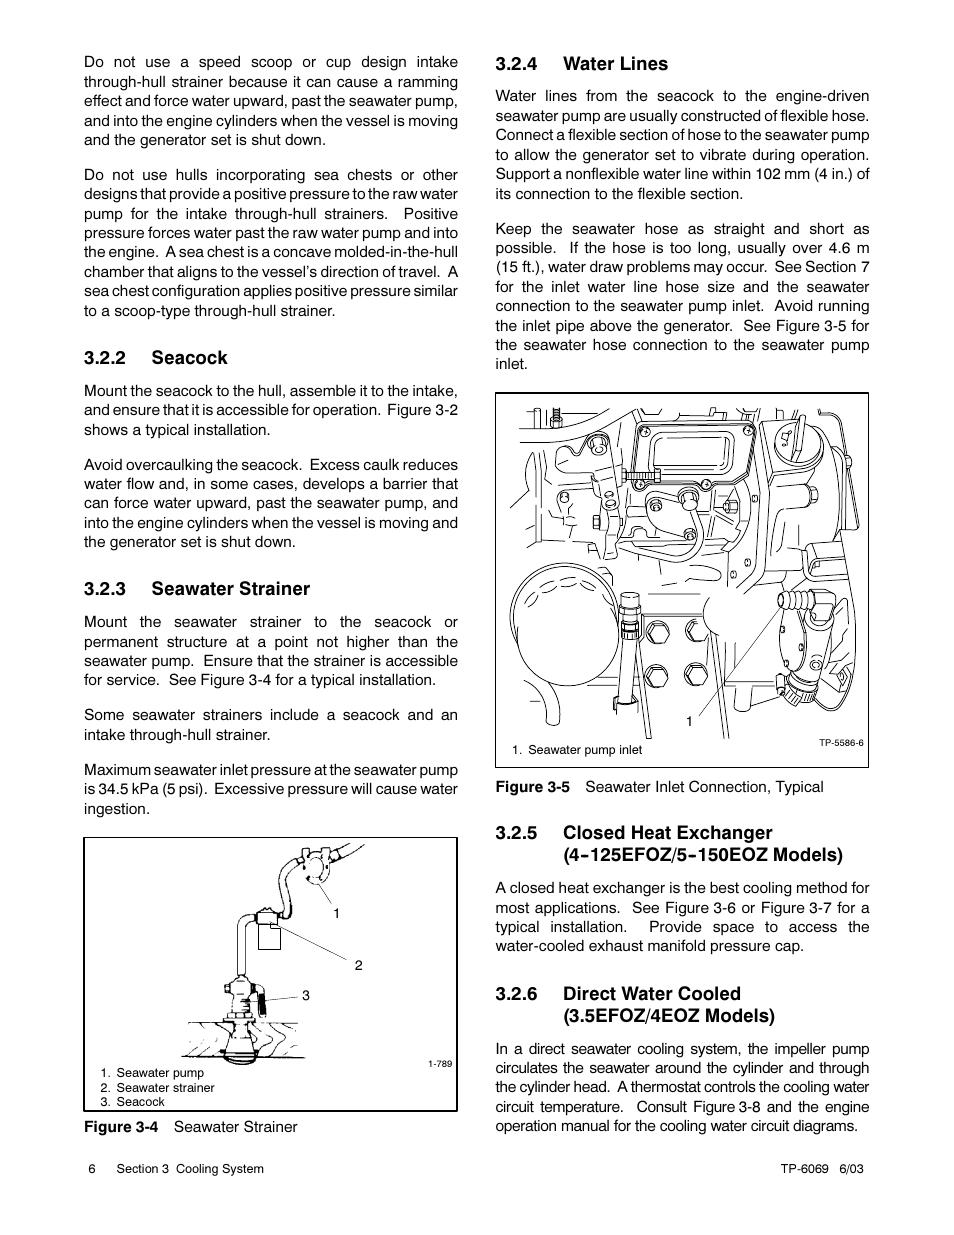 Kohler Marine Generator Sets 11efoz 13eoz User Manual Page 16 92 Plumbing Diagram Below Showing The Utilisation Of An Enginedriven Also For 4efoz 5eoz 20efoz 24eoz